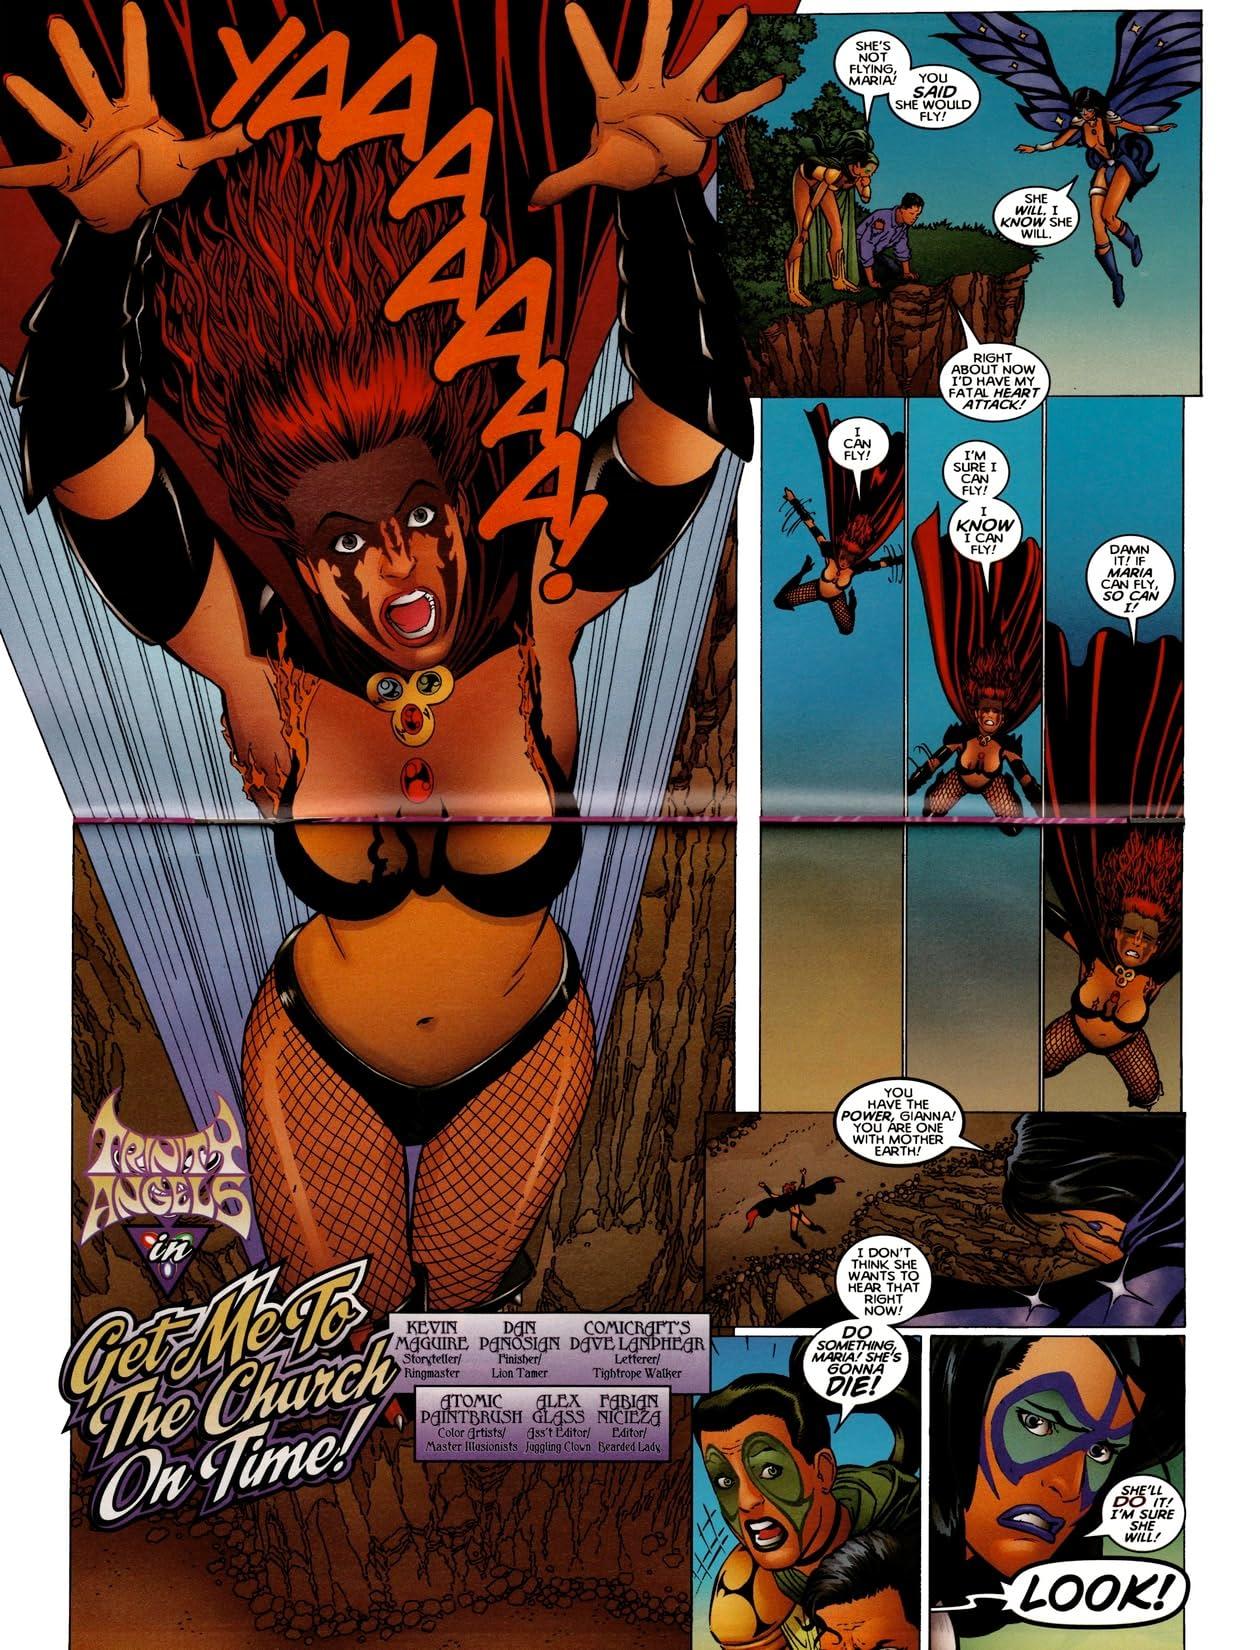 Trinity Angels (1997-1998) #3